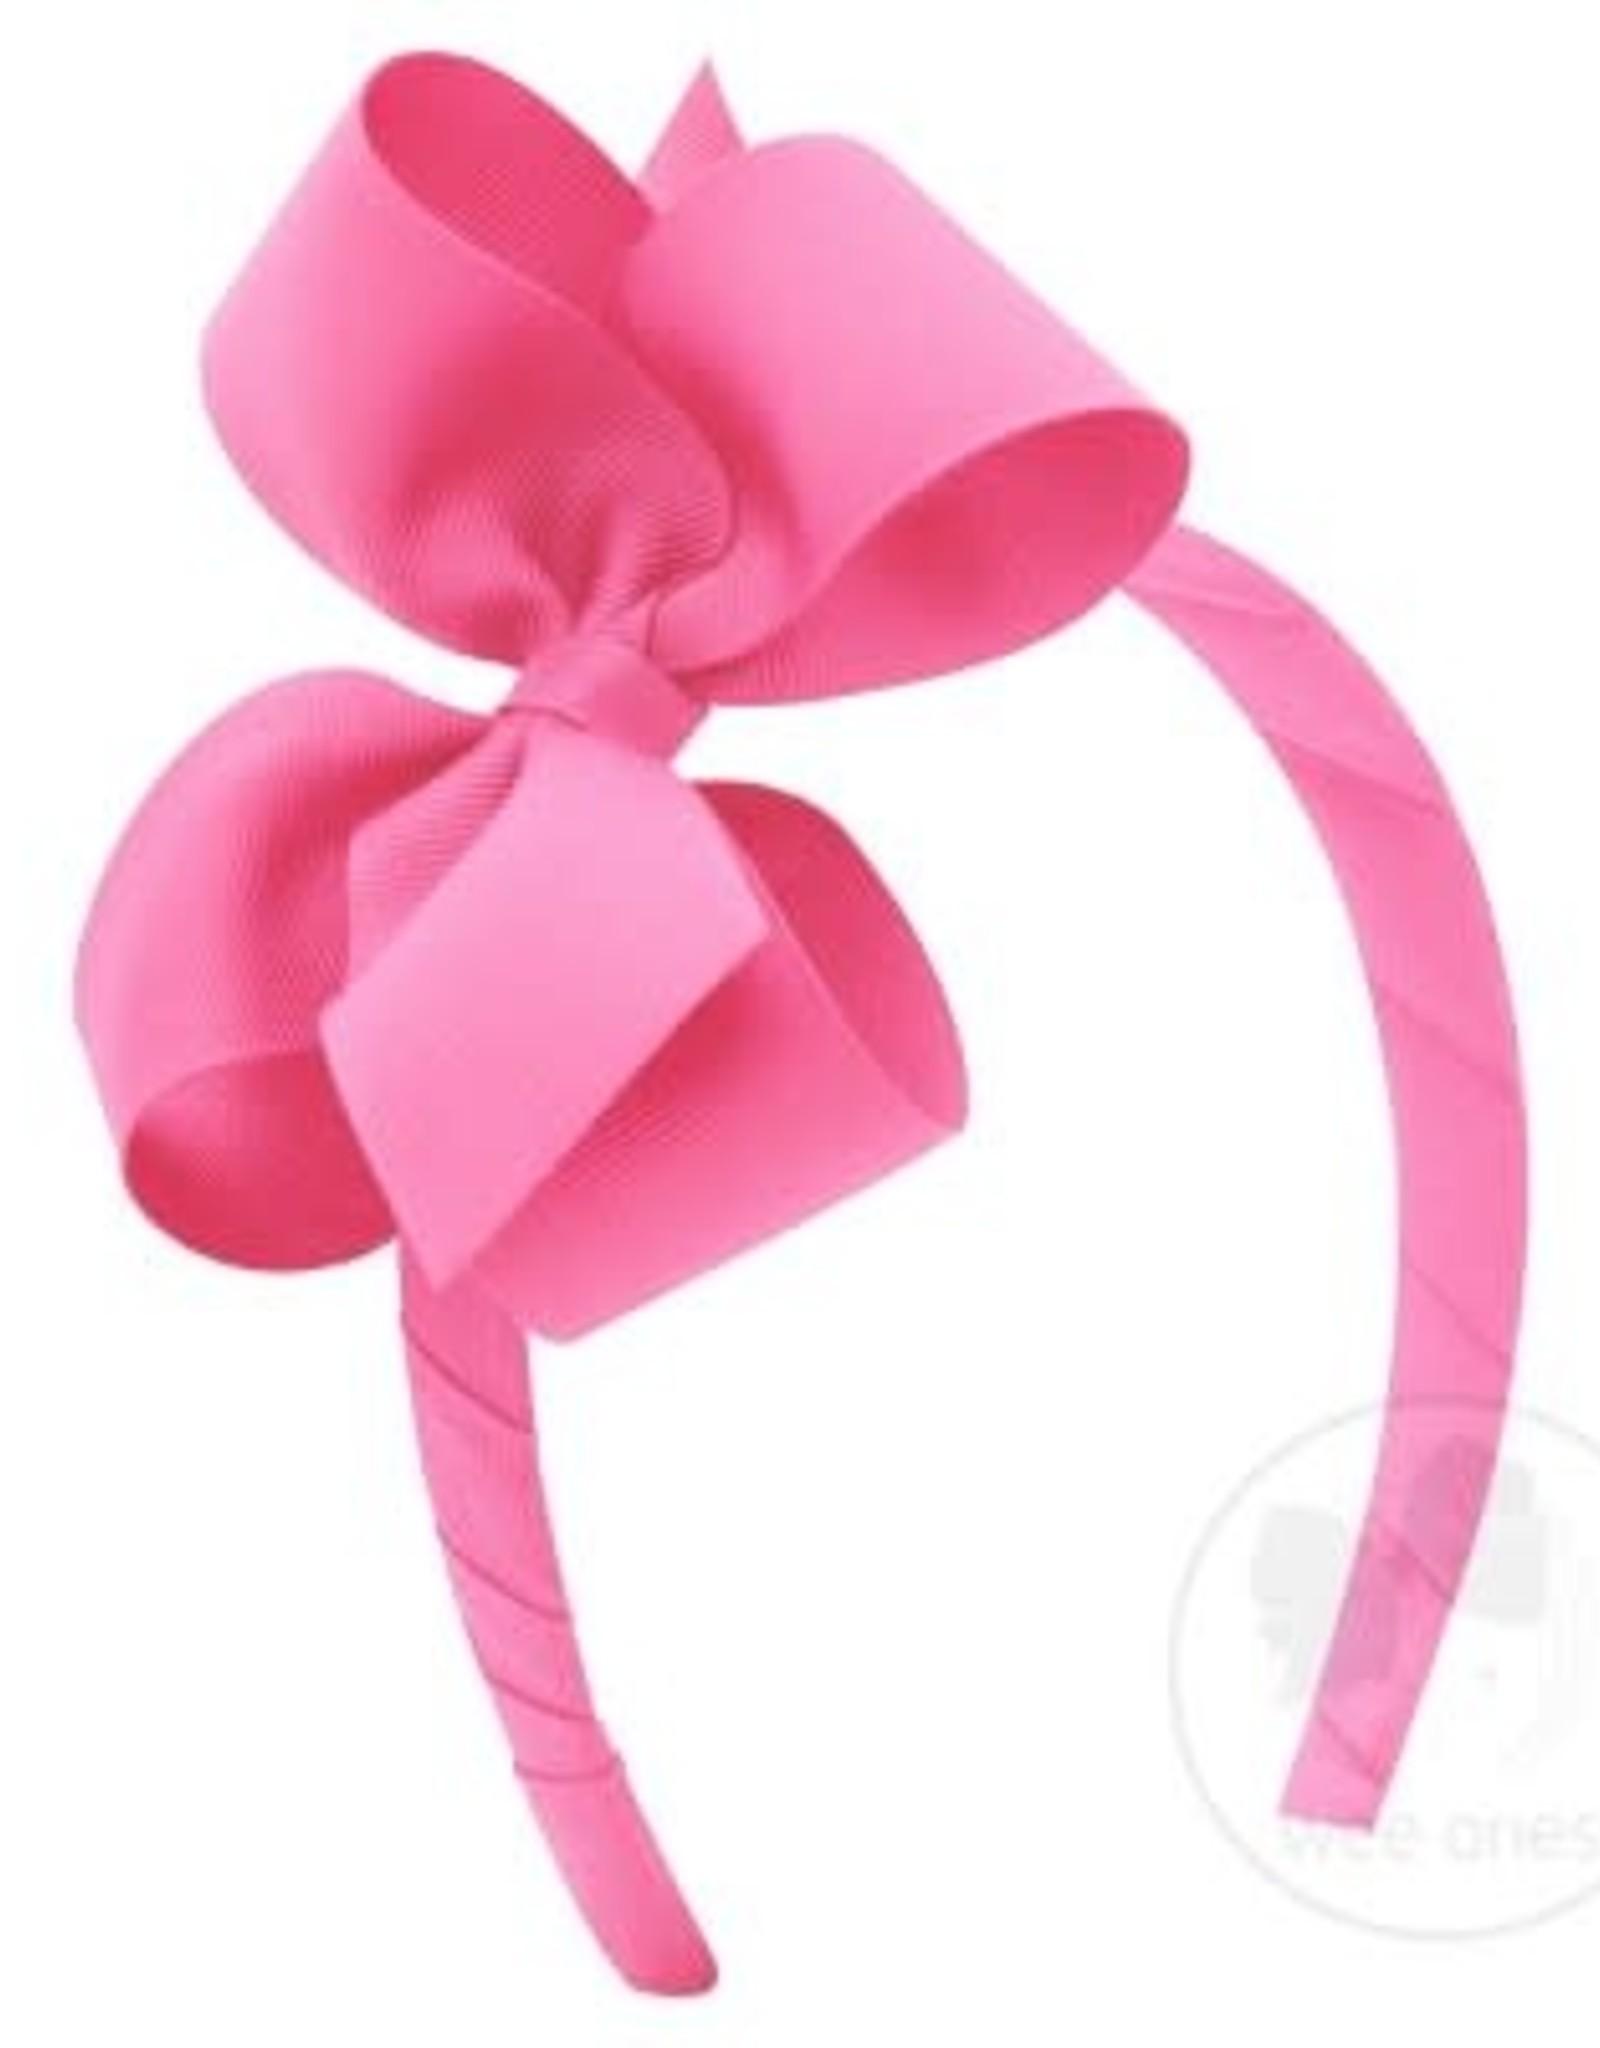 WeeOnes Grosgrain Add-a-Bow Headband Hot Pink